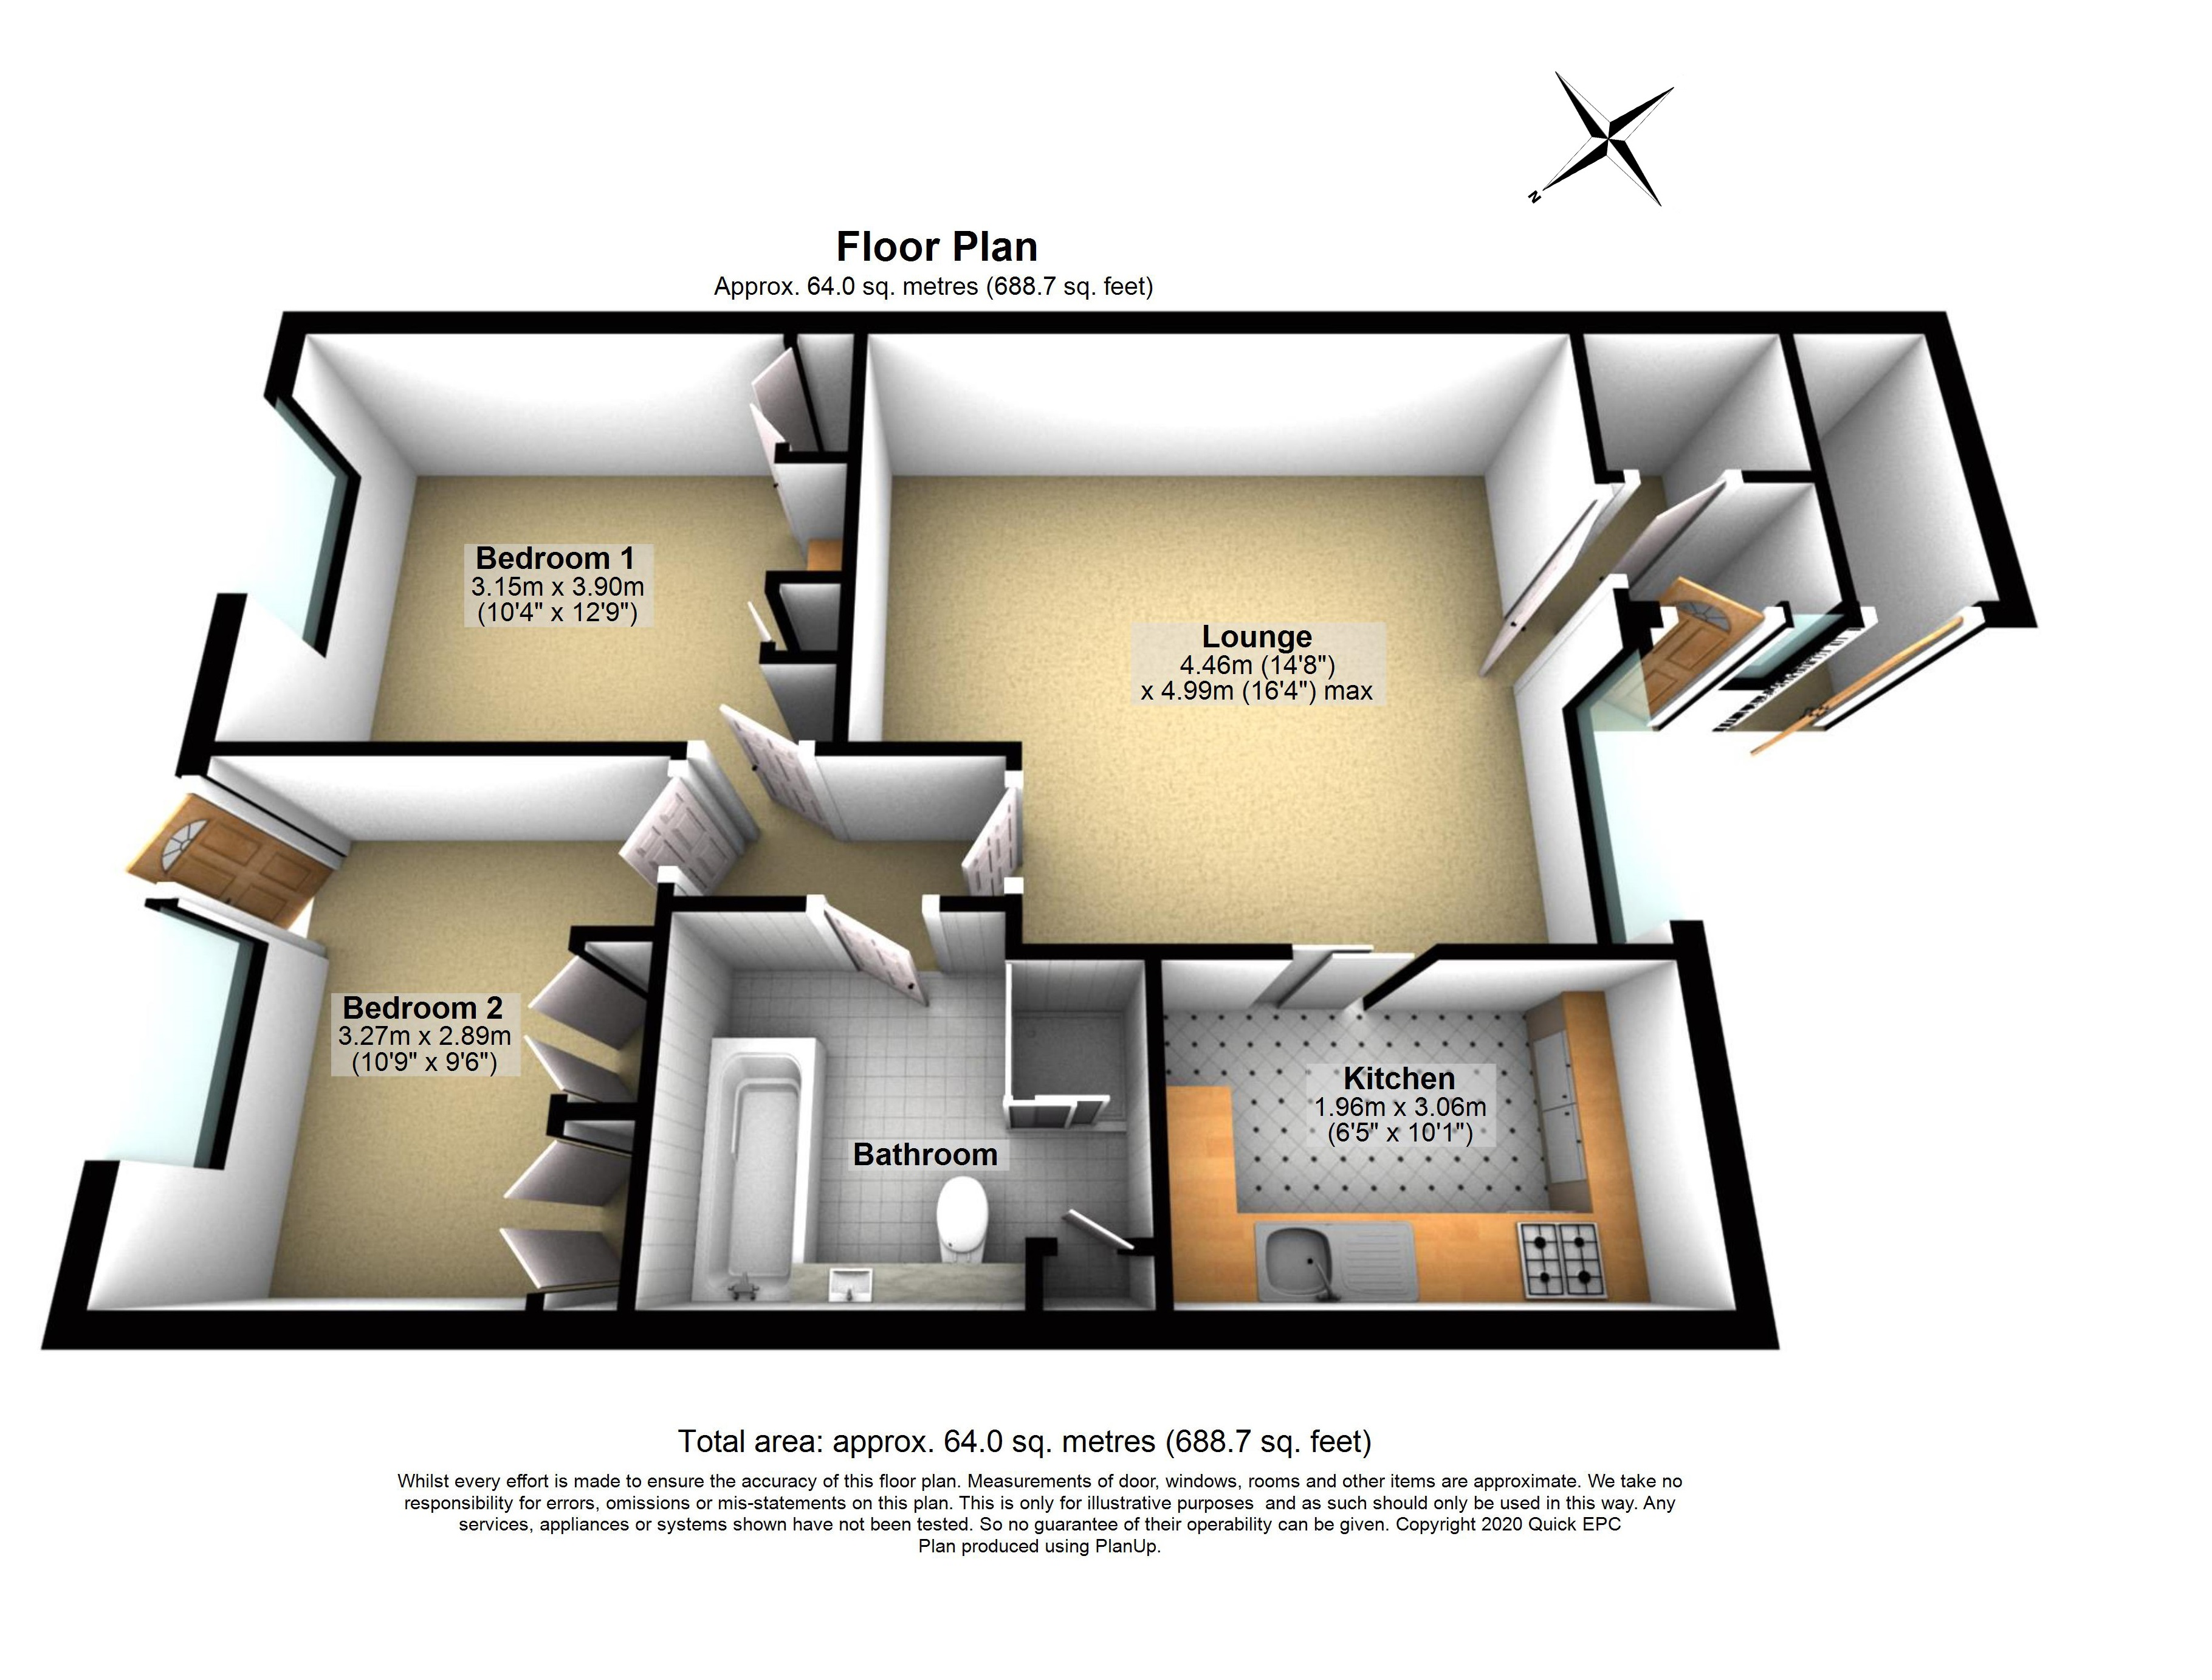 7 Clarke Place Floorplan